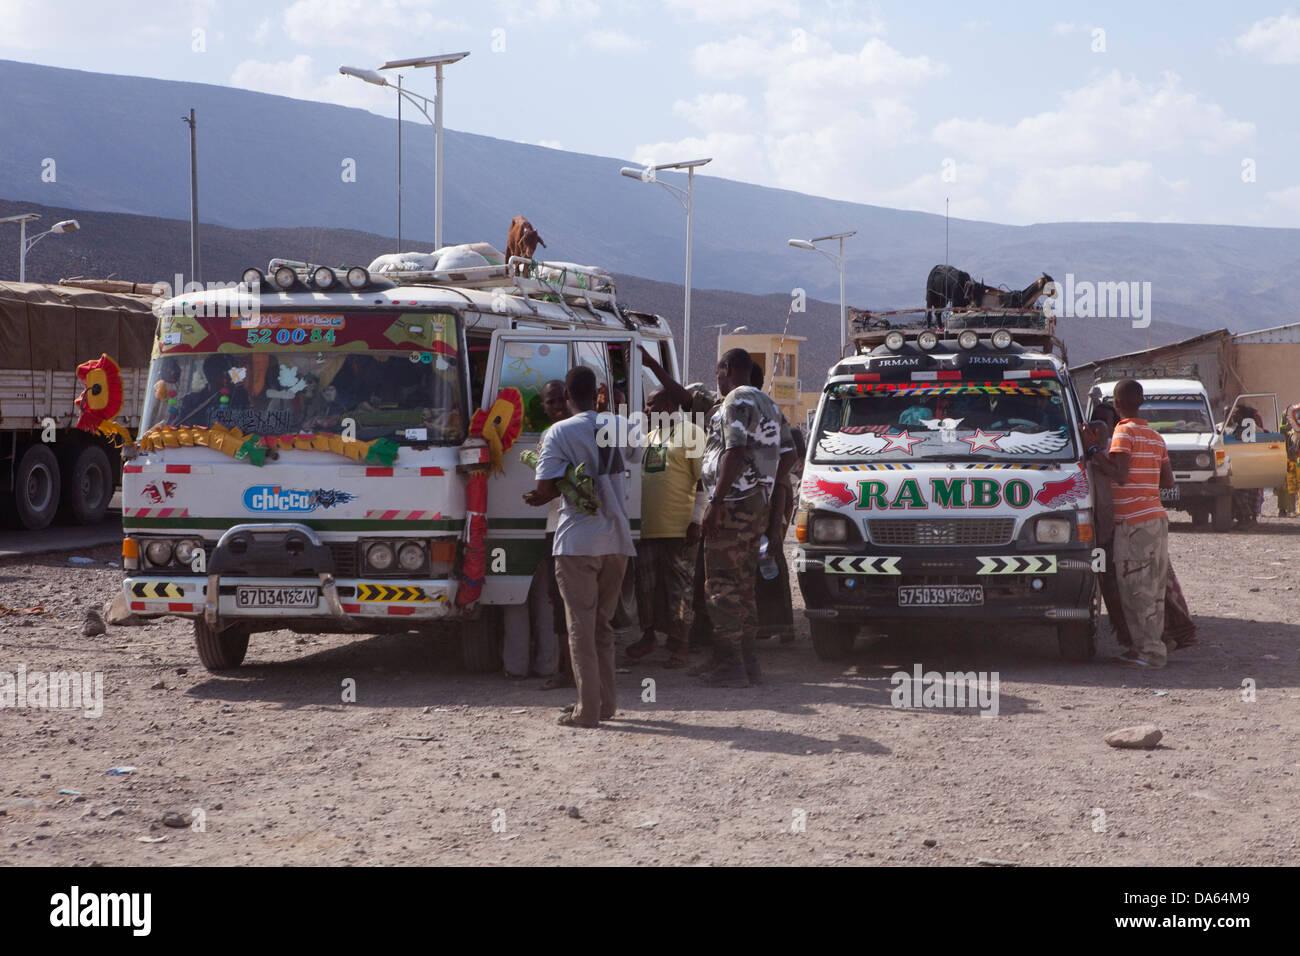 Coches, automóviles, pulgadas, Djibouti, Galifi, Danakil, África, expedición, tráfico, transporte, Imagen De Stock